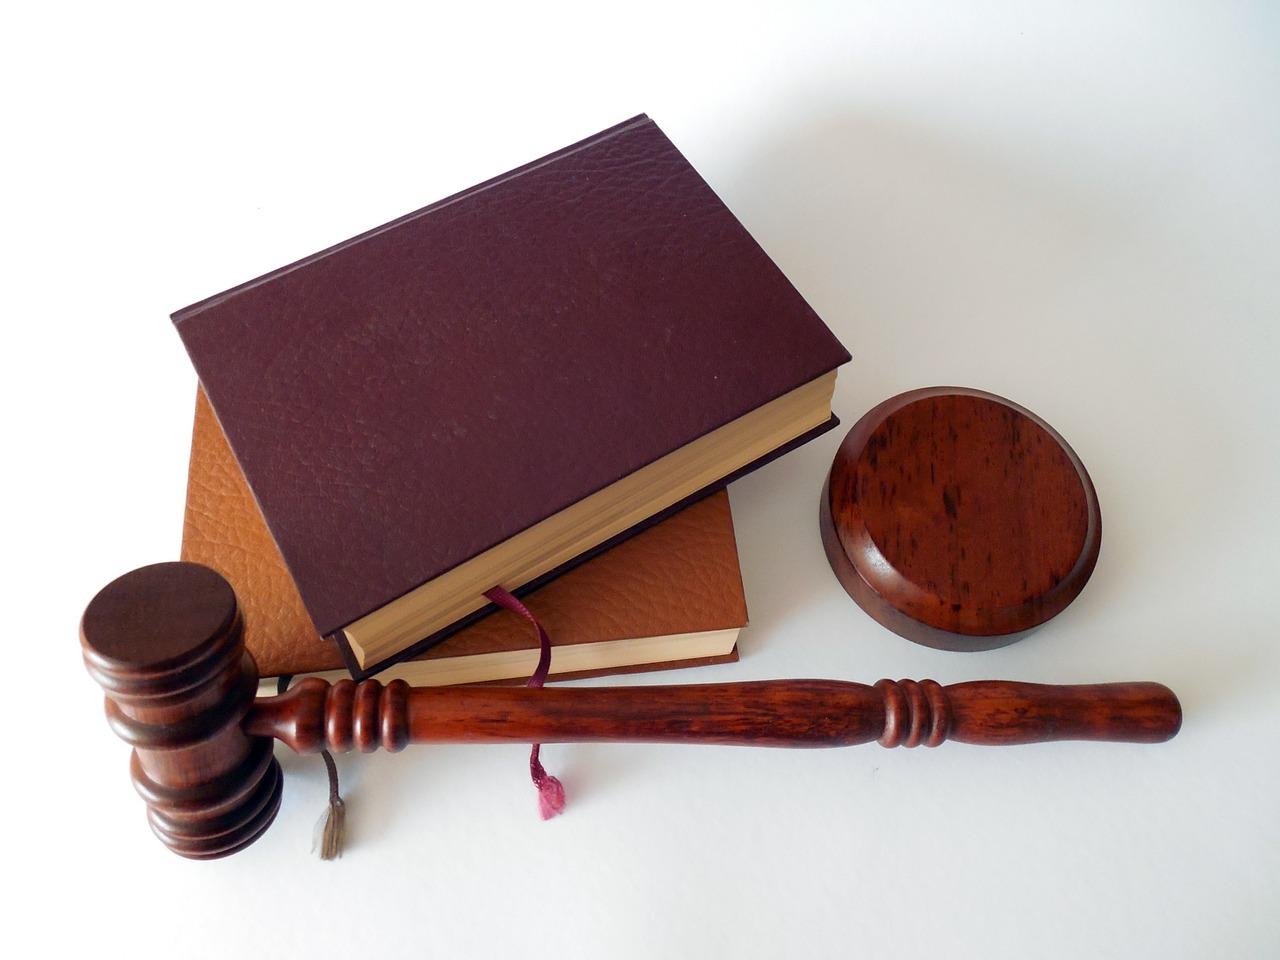 Condemnation vs. Conviction